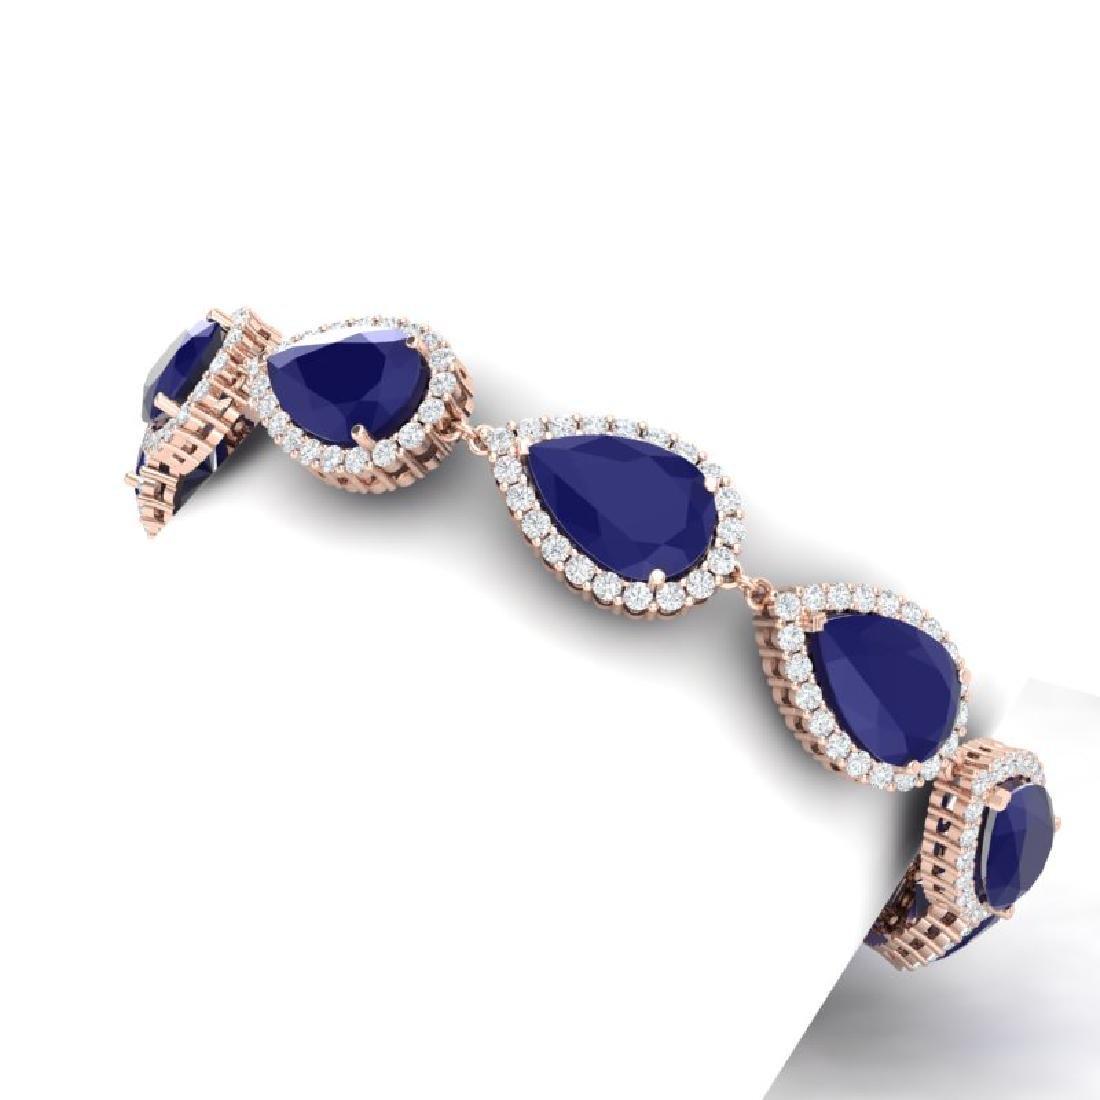 42 CTW Royalty Sapphire & VS Diamond Bracelet 18K Rose - 2